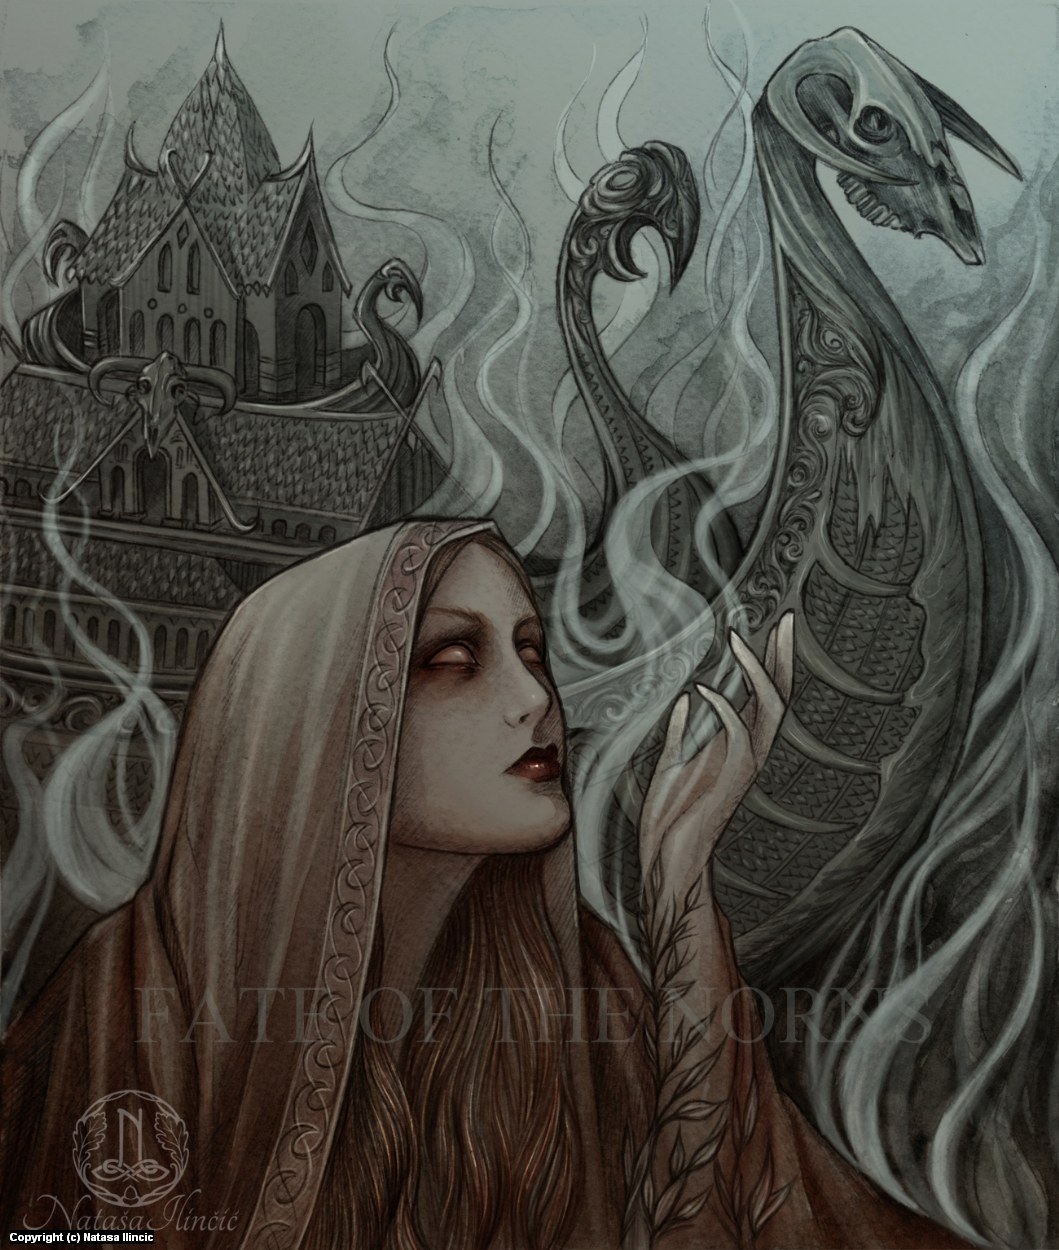 Volva's Vision Artwork by Natasa Ilincic